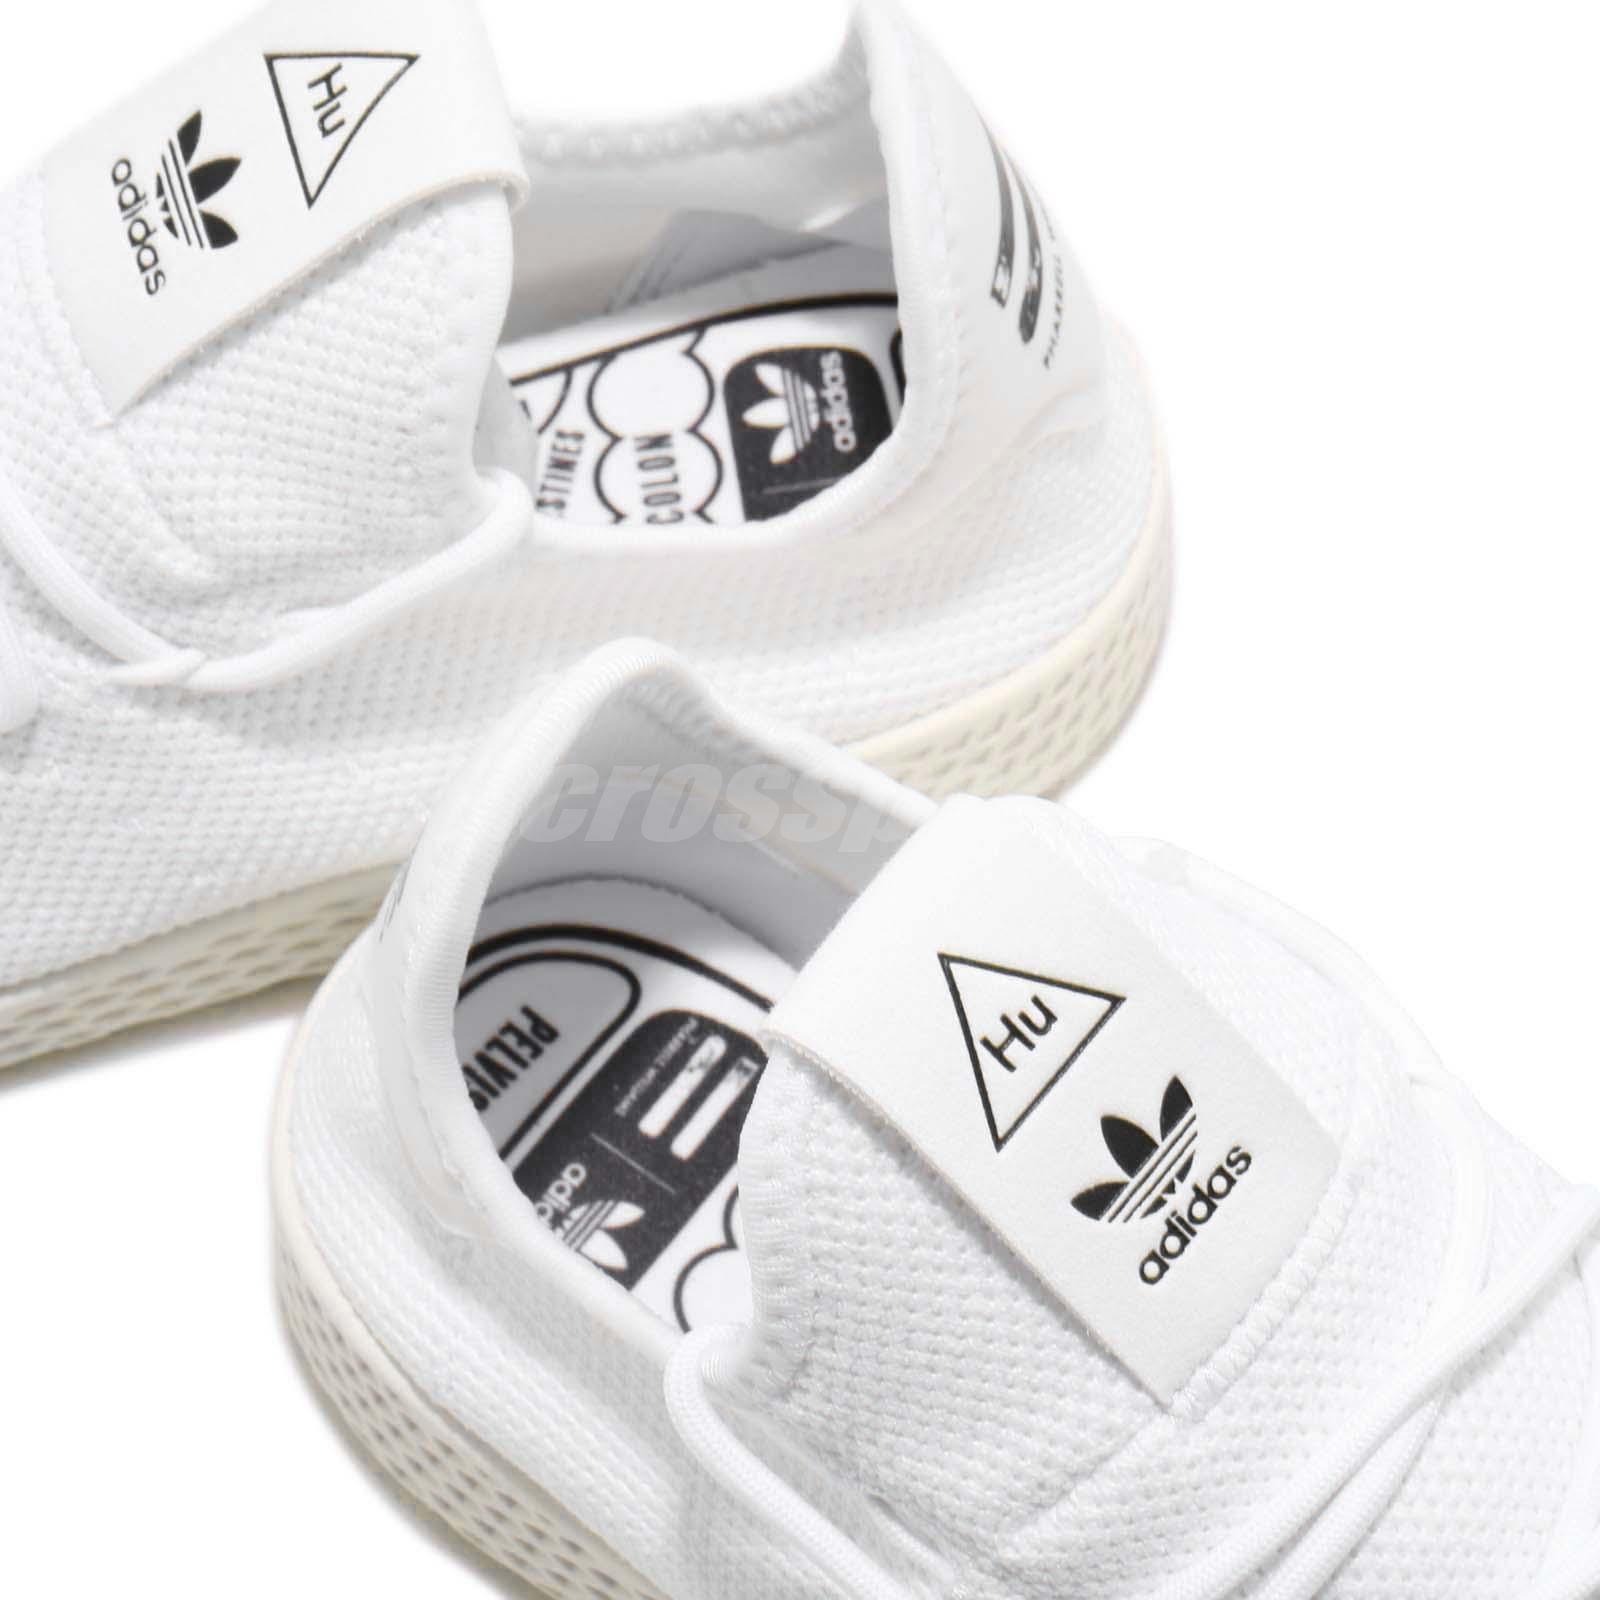 release date ef667 69986 adidas Originals PW Tennis Hu Pharrell Williams White Black Men ...